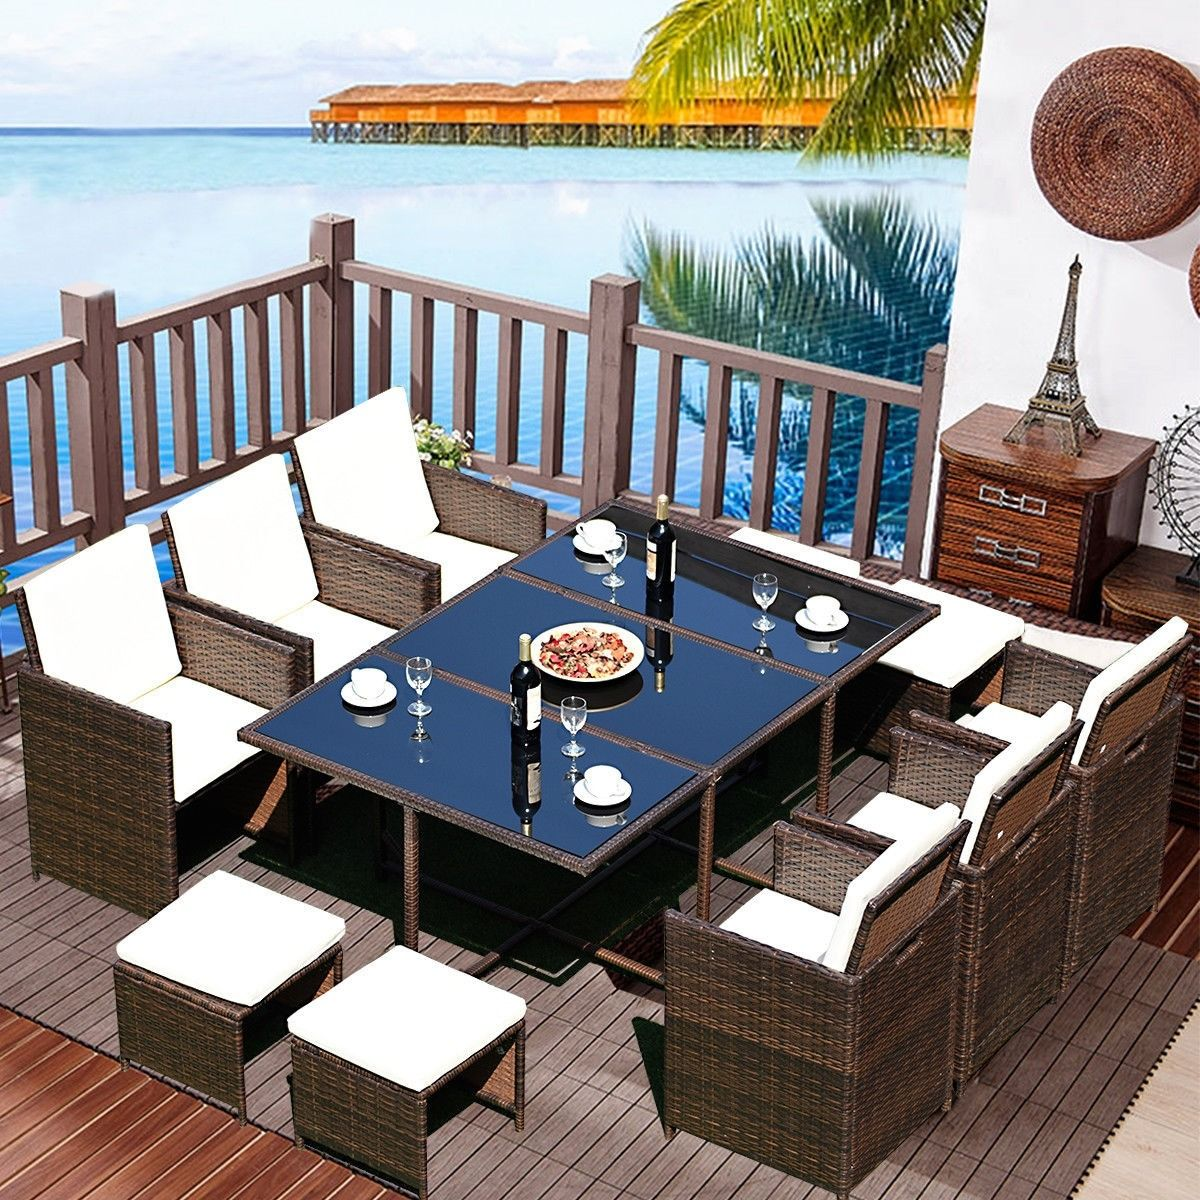 11 Pcs Outdoor Patio Dining Rattan Wicker Furniture Set 595 95